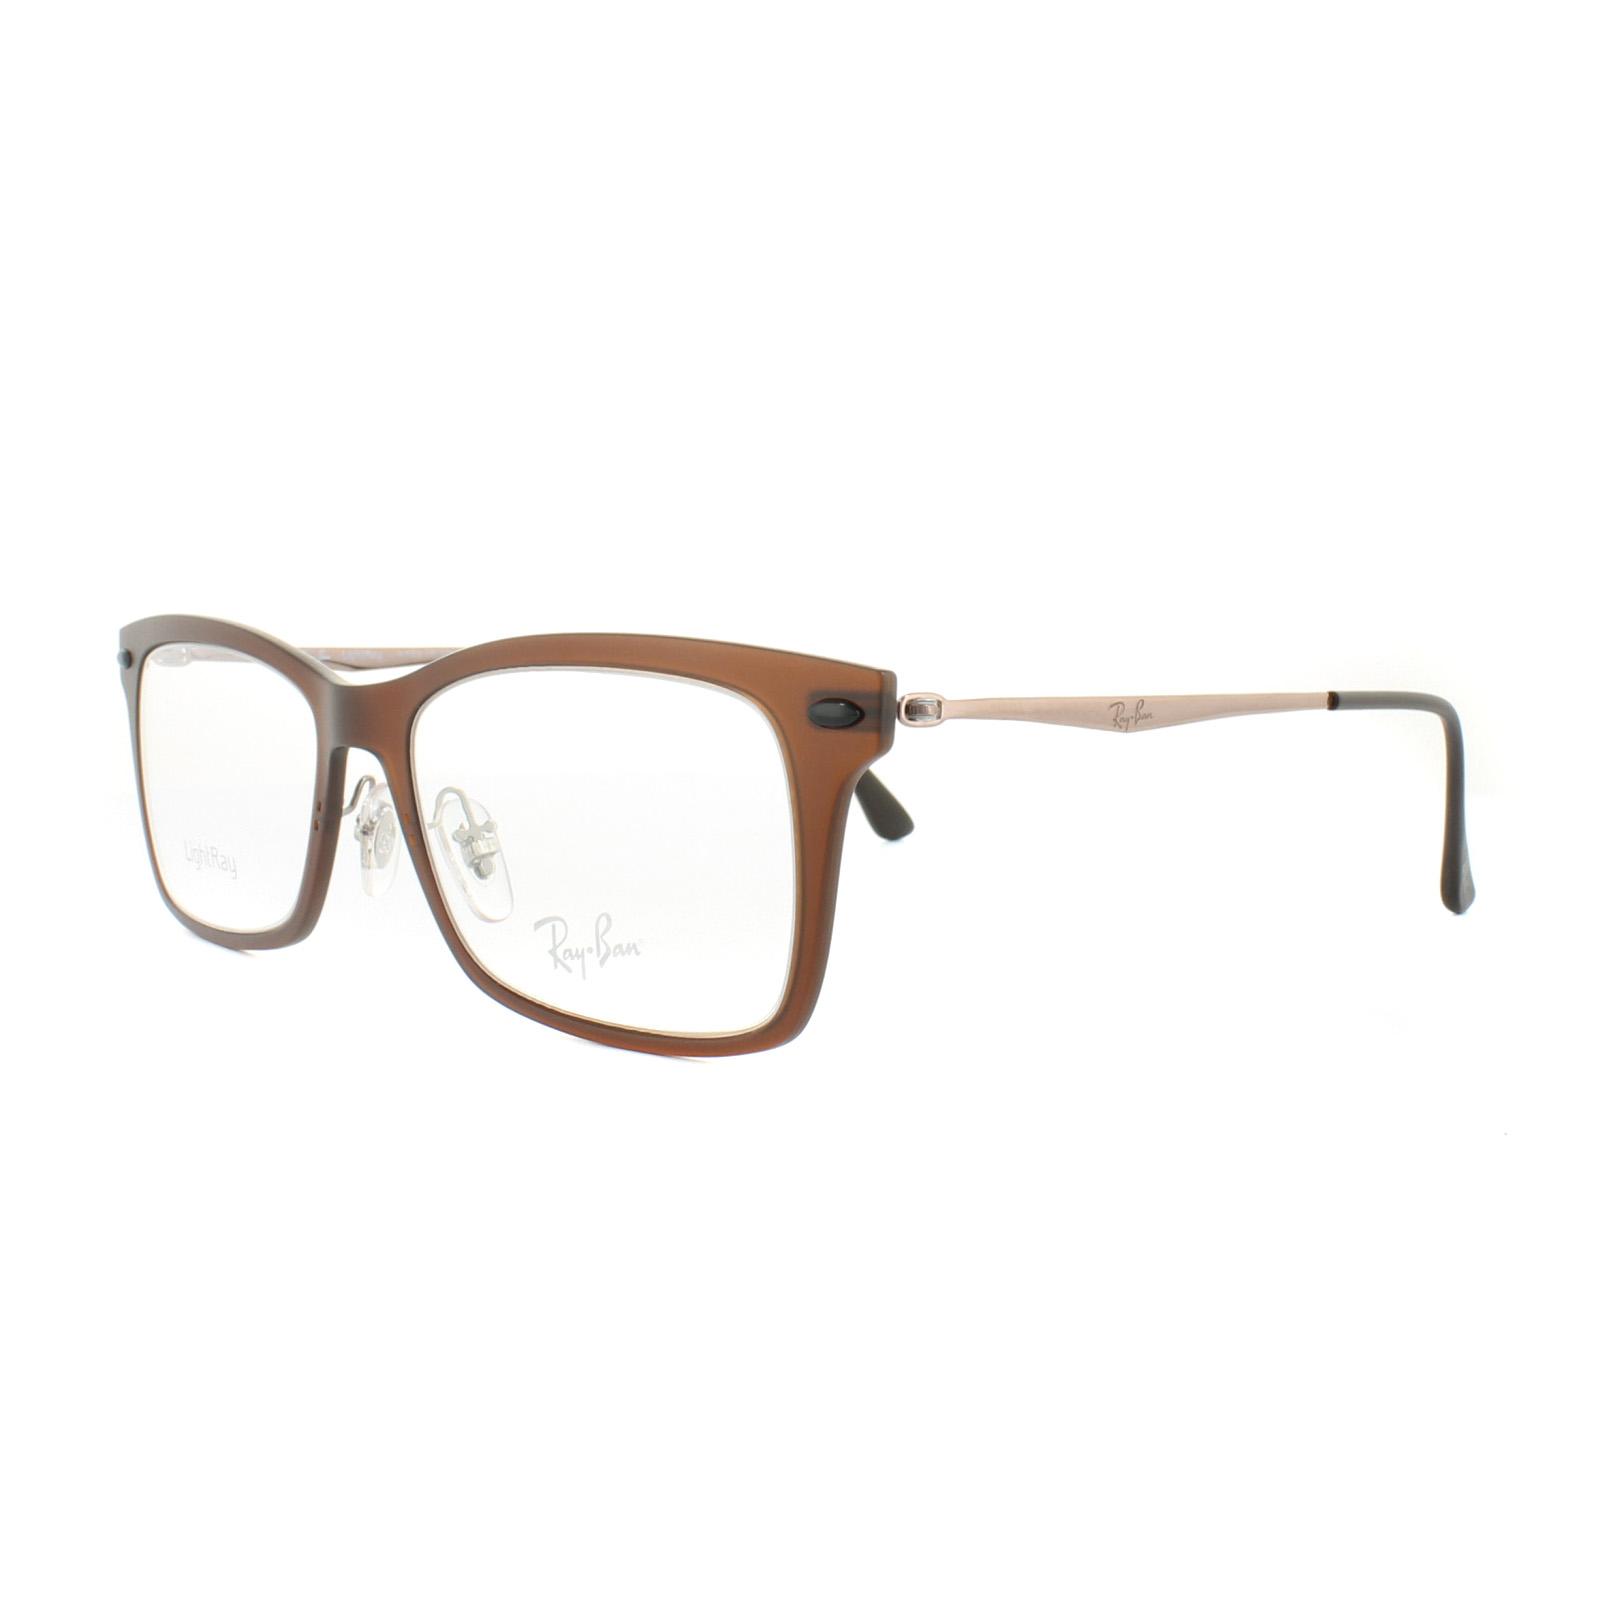 95a4d3278c Sentinel Ray-Ban Glasses Frames RX 7039 2077 Matt Black Mens Womens 53mm